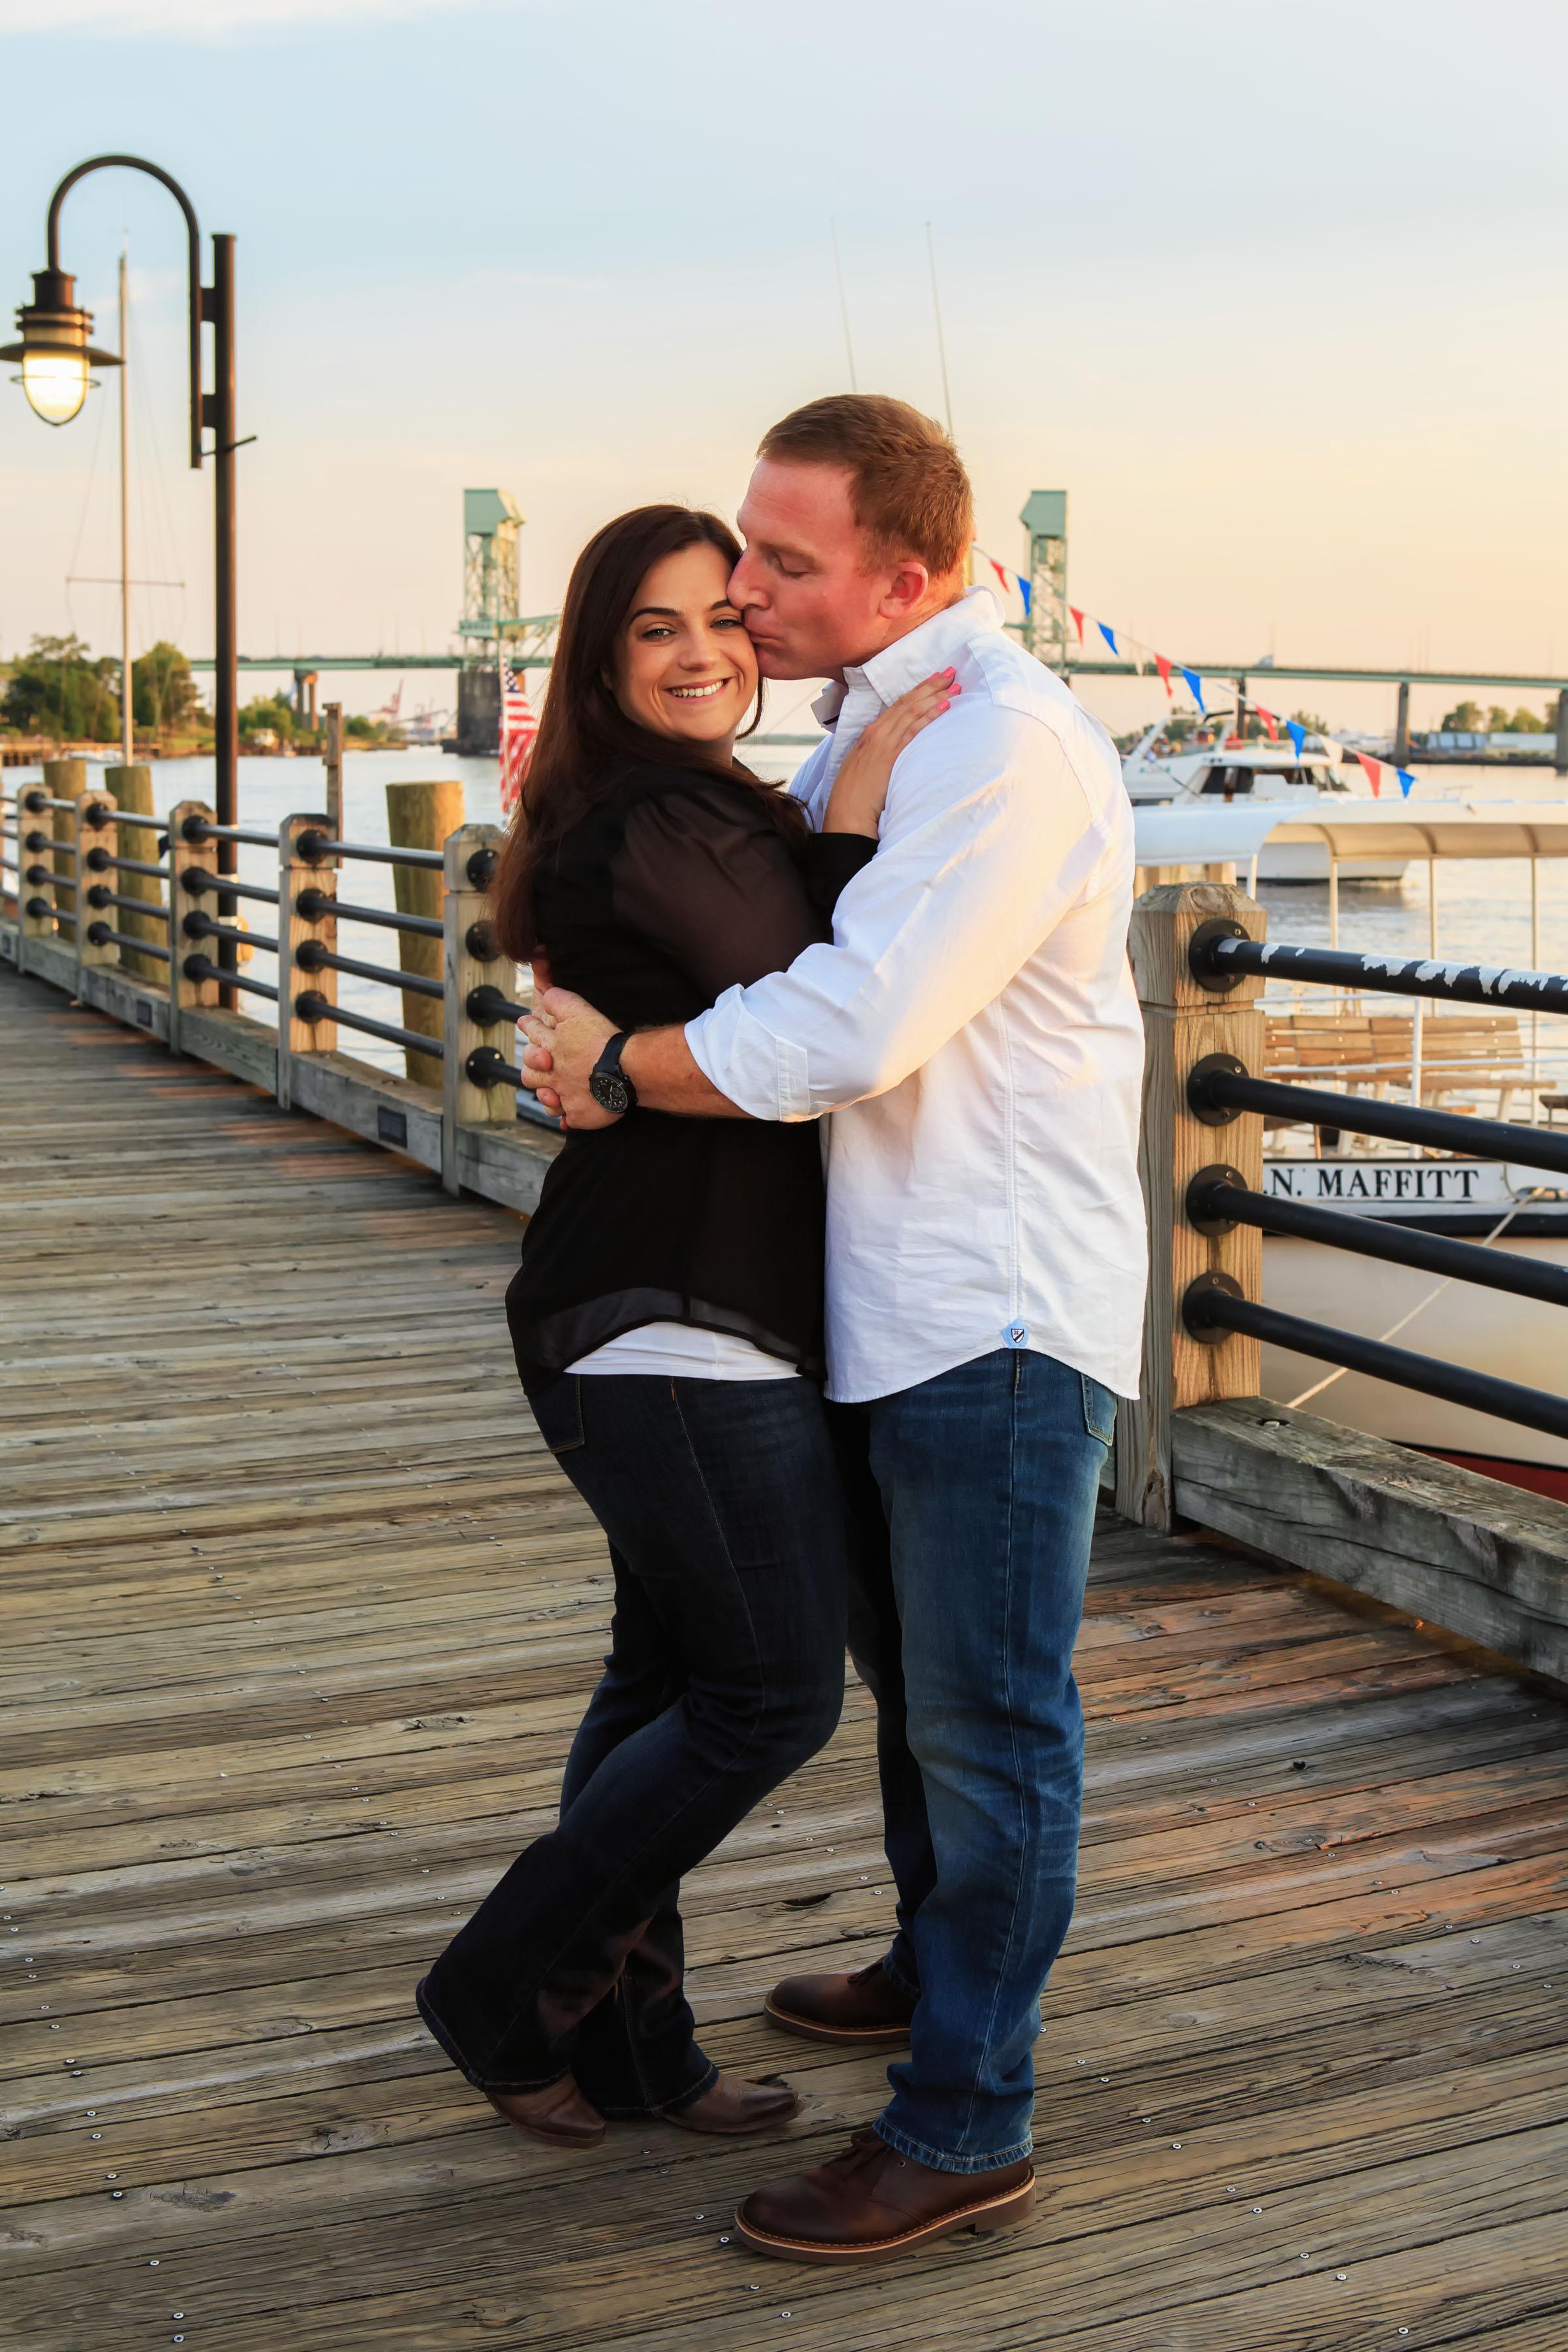 Wilmington_NC_Photographer_Tiffany_Abruzzo_Photography_Engagement_31.jpg